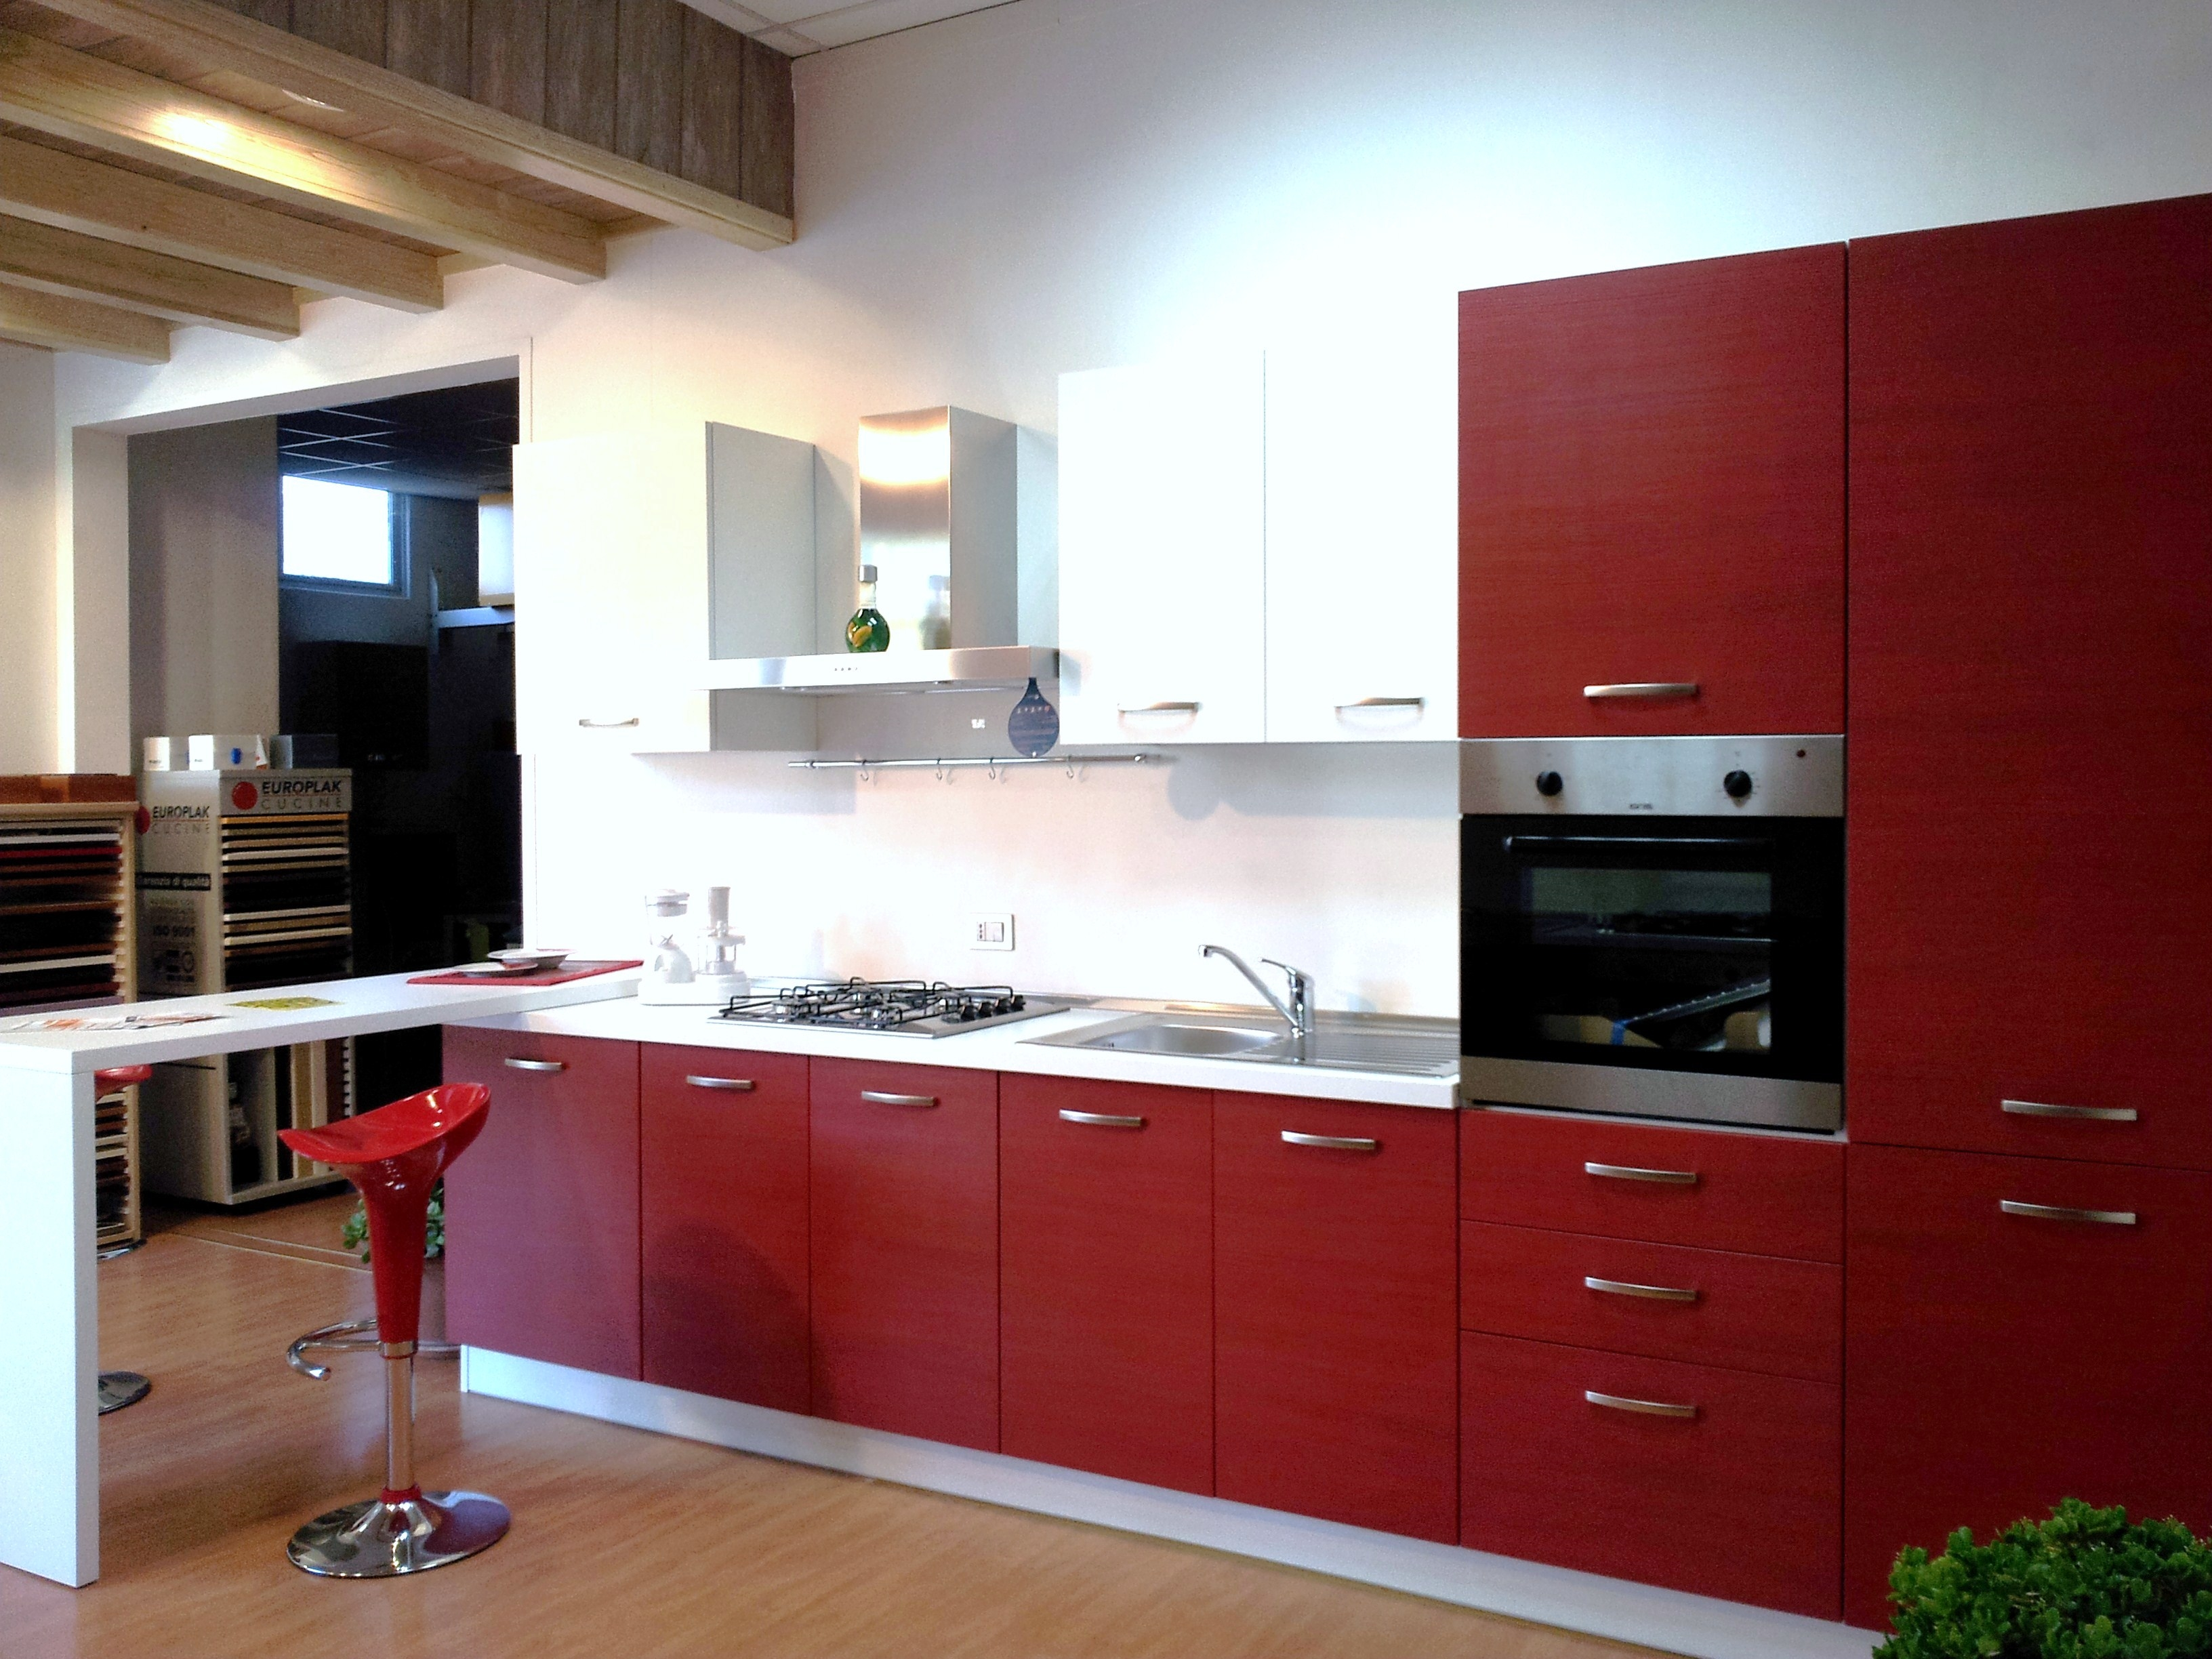 Cucina moderna con penisola cucine a prezzi scontati - Penisola cucina ikea ...